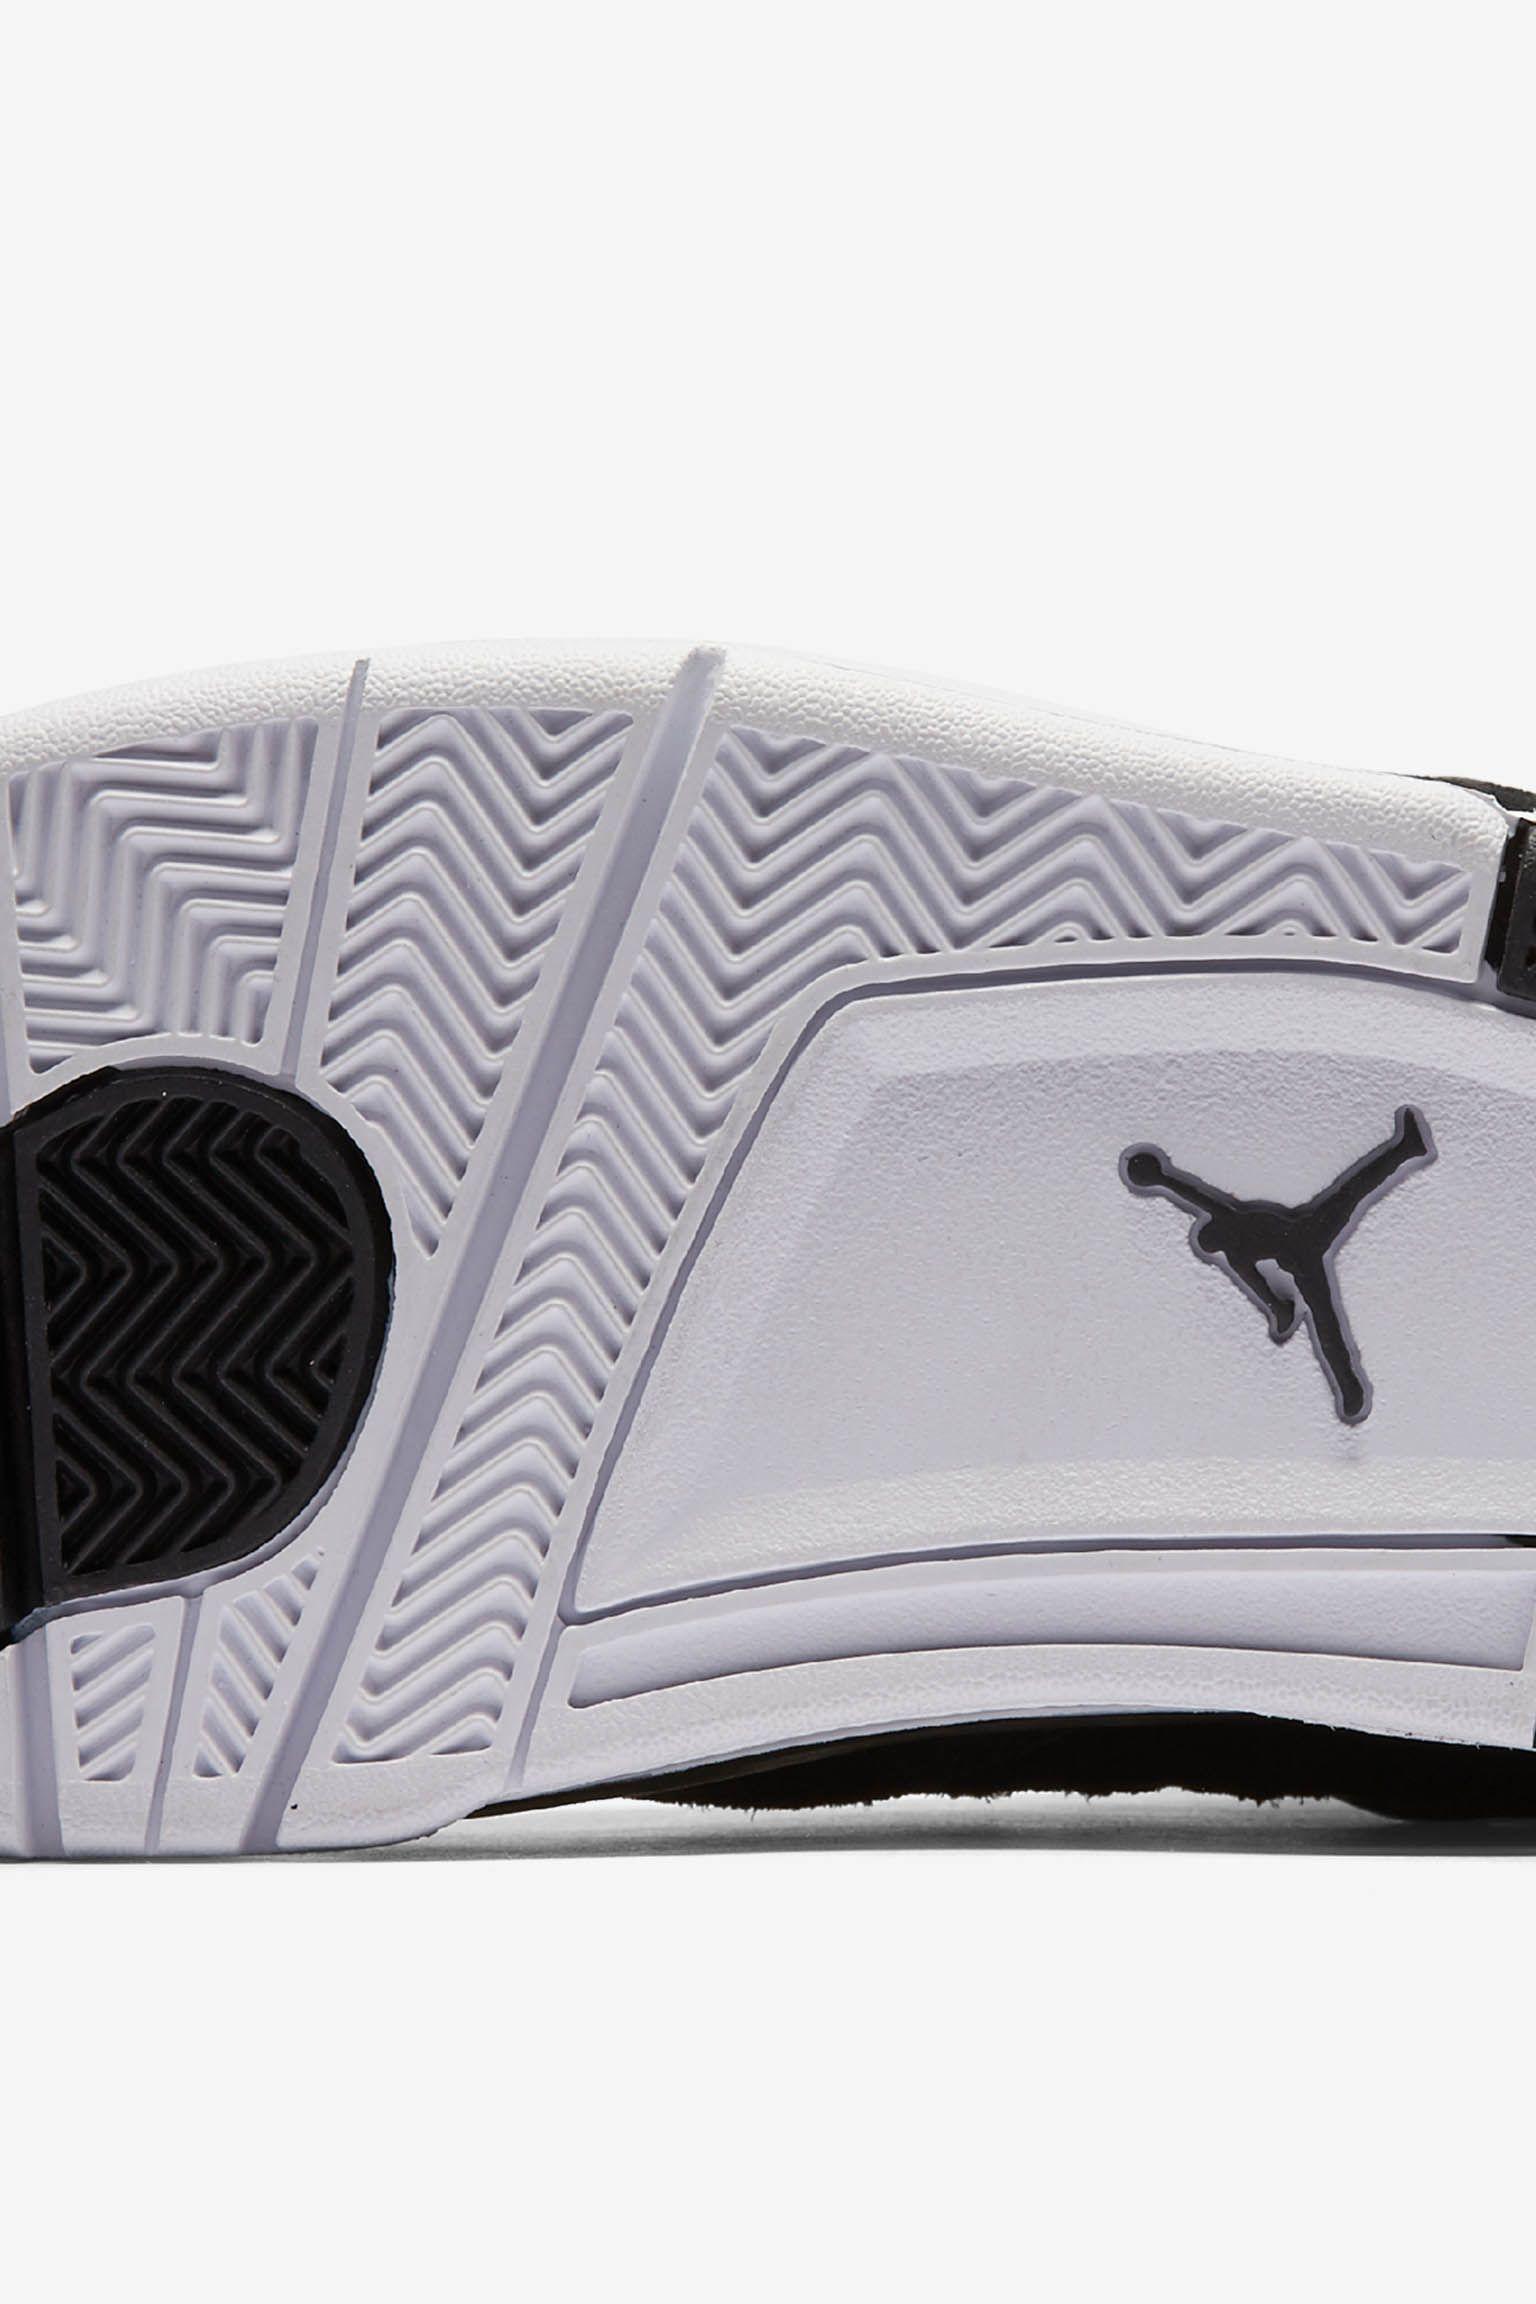 Air Jordan 4 Retro 'Royalty'